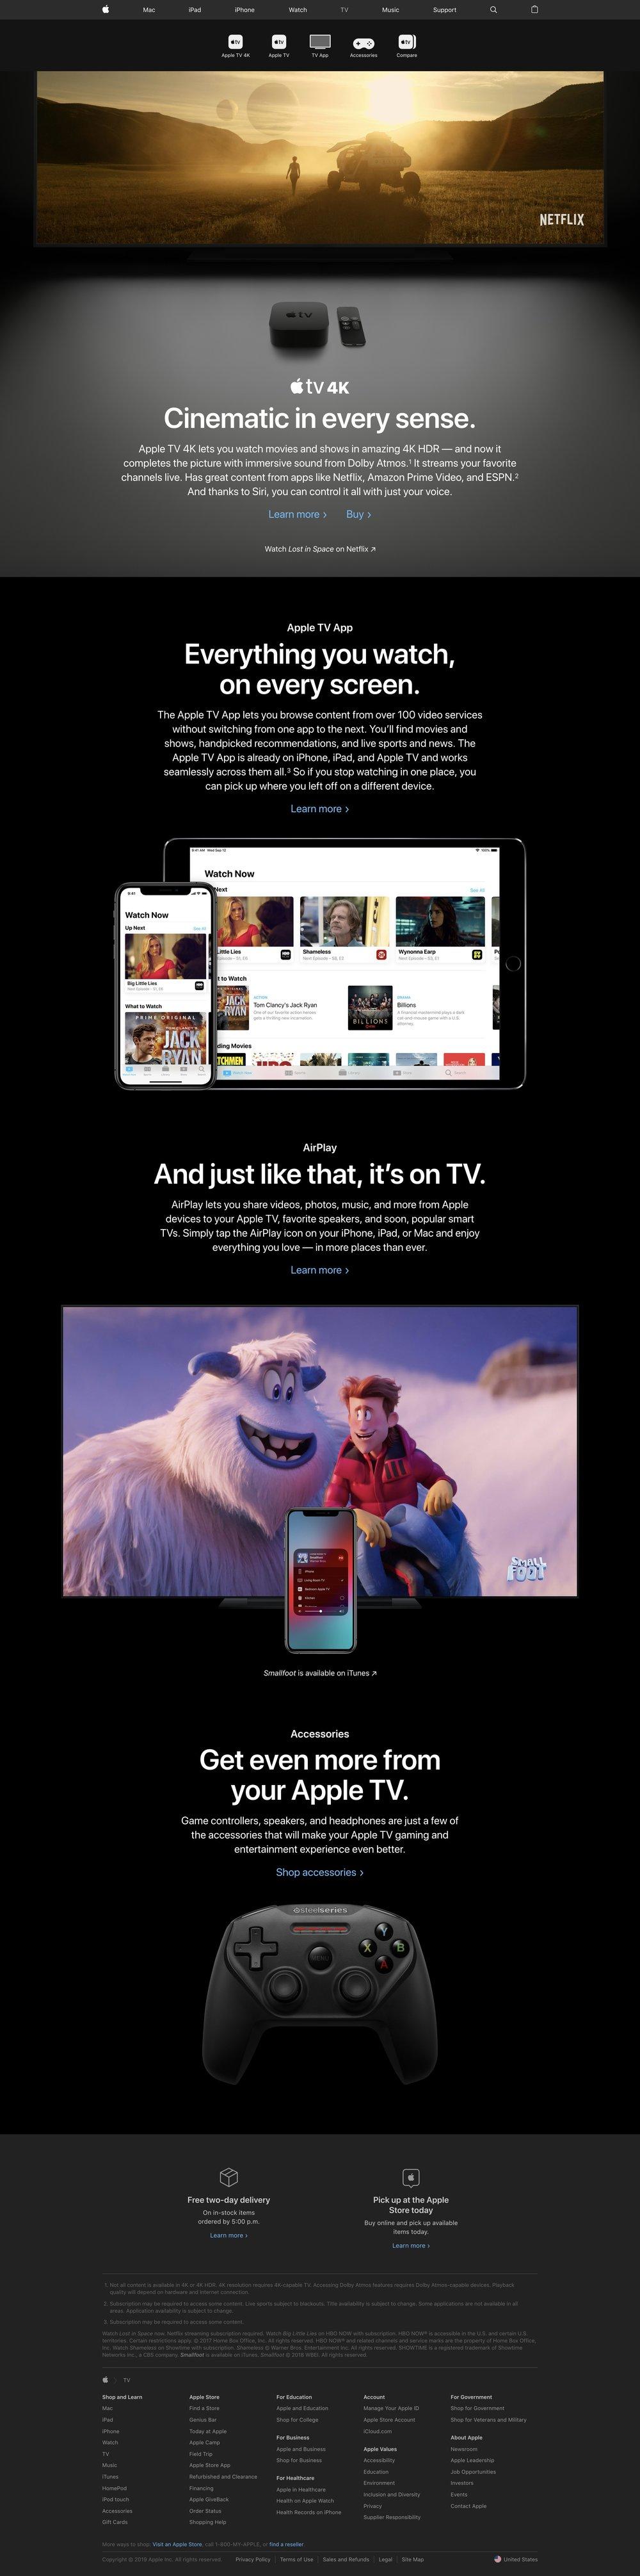 screencapture-apple-tv-2019-03-10-11_49_22.jpg